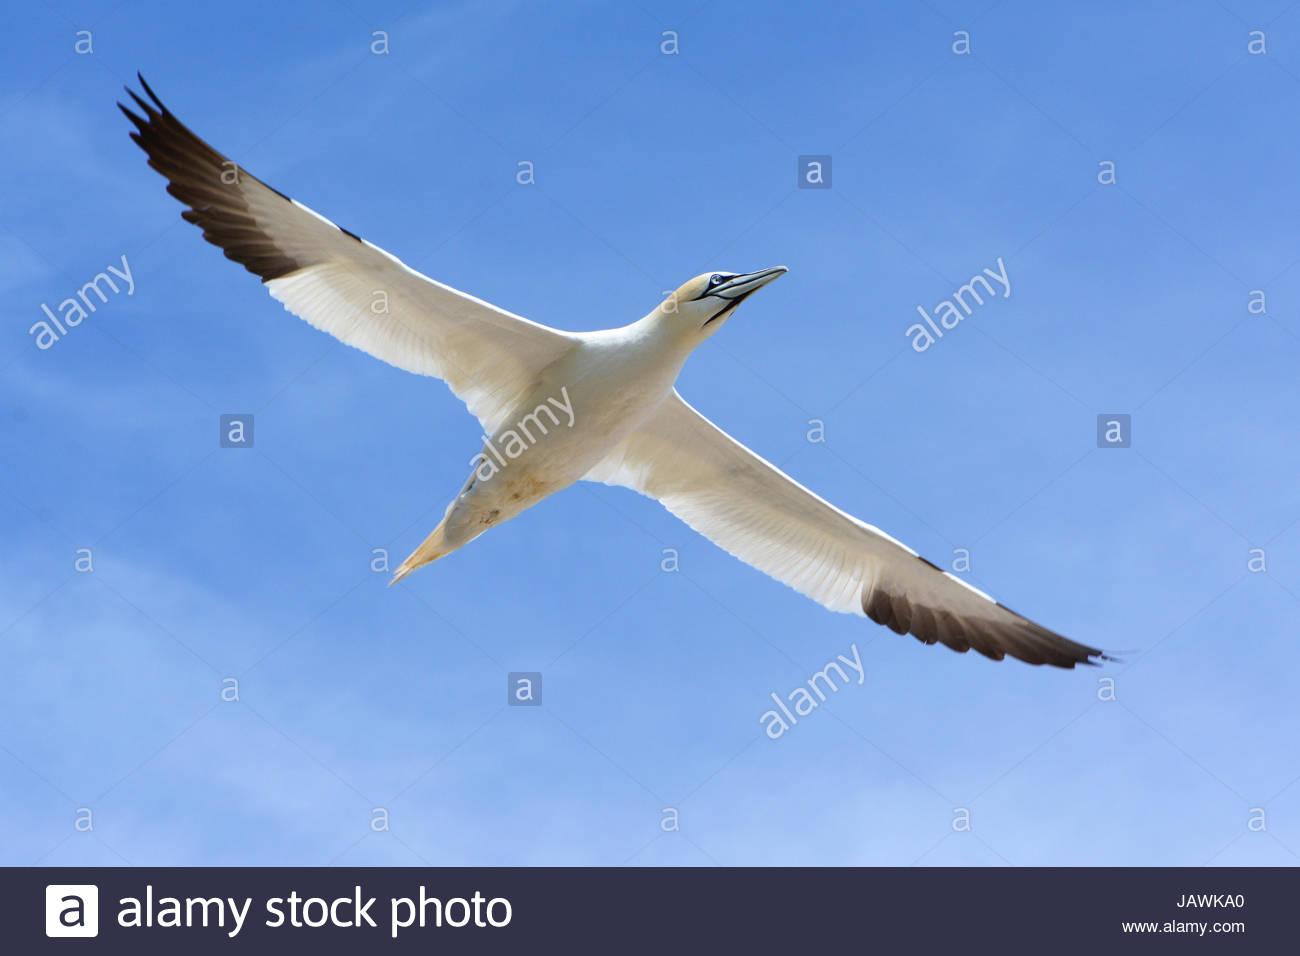 A northern gannet, Morus bassanus, in flight. - Stock Image